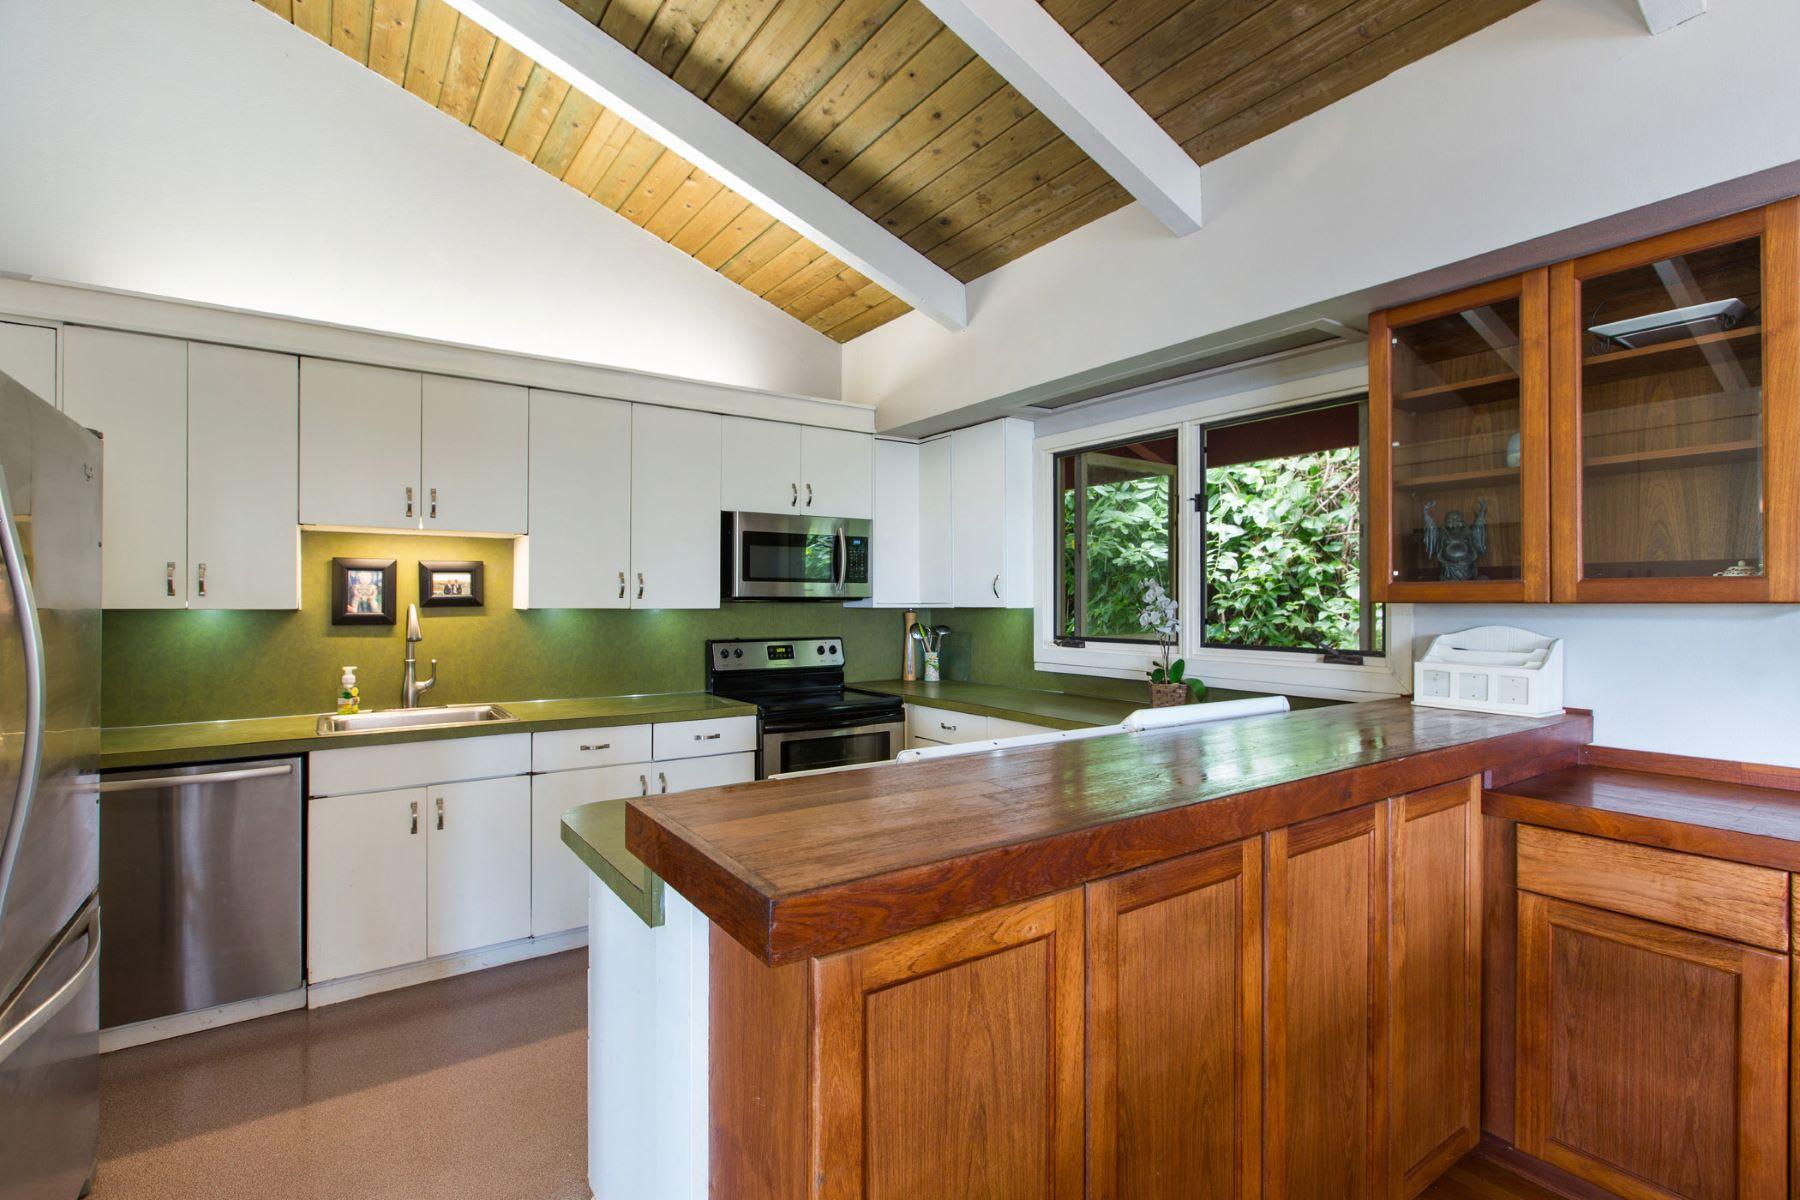 Additional photo for property listing at Peaceful Rainforest Tree House 3155 Kaohinani Drive Honolulu, Hawaii 96817 United States